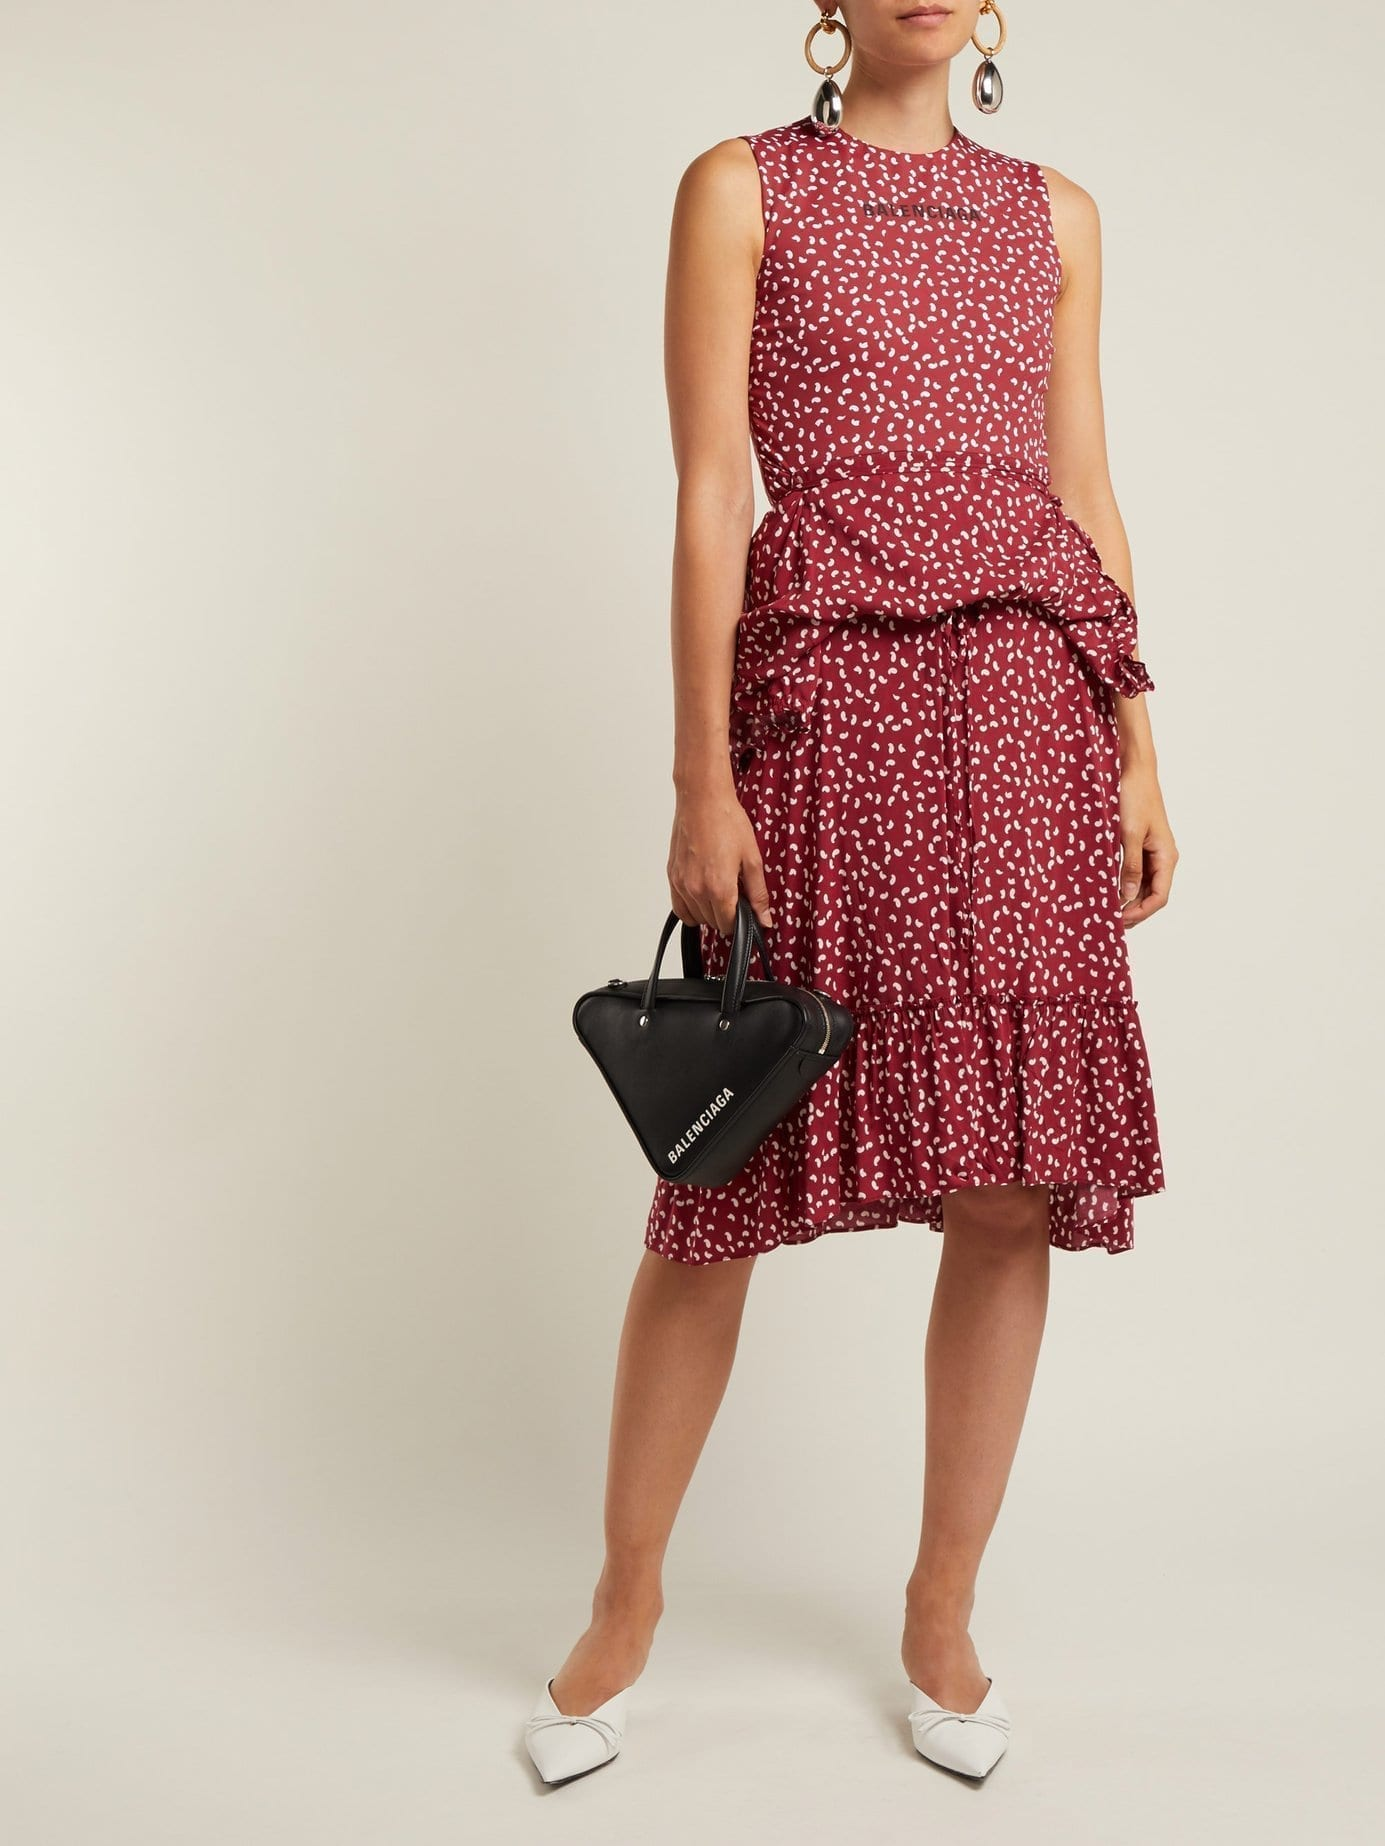 BALENCIAGA Paisley Print Layered Burgundy Dress